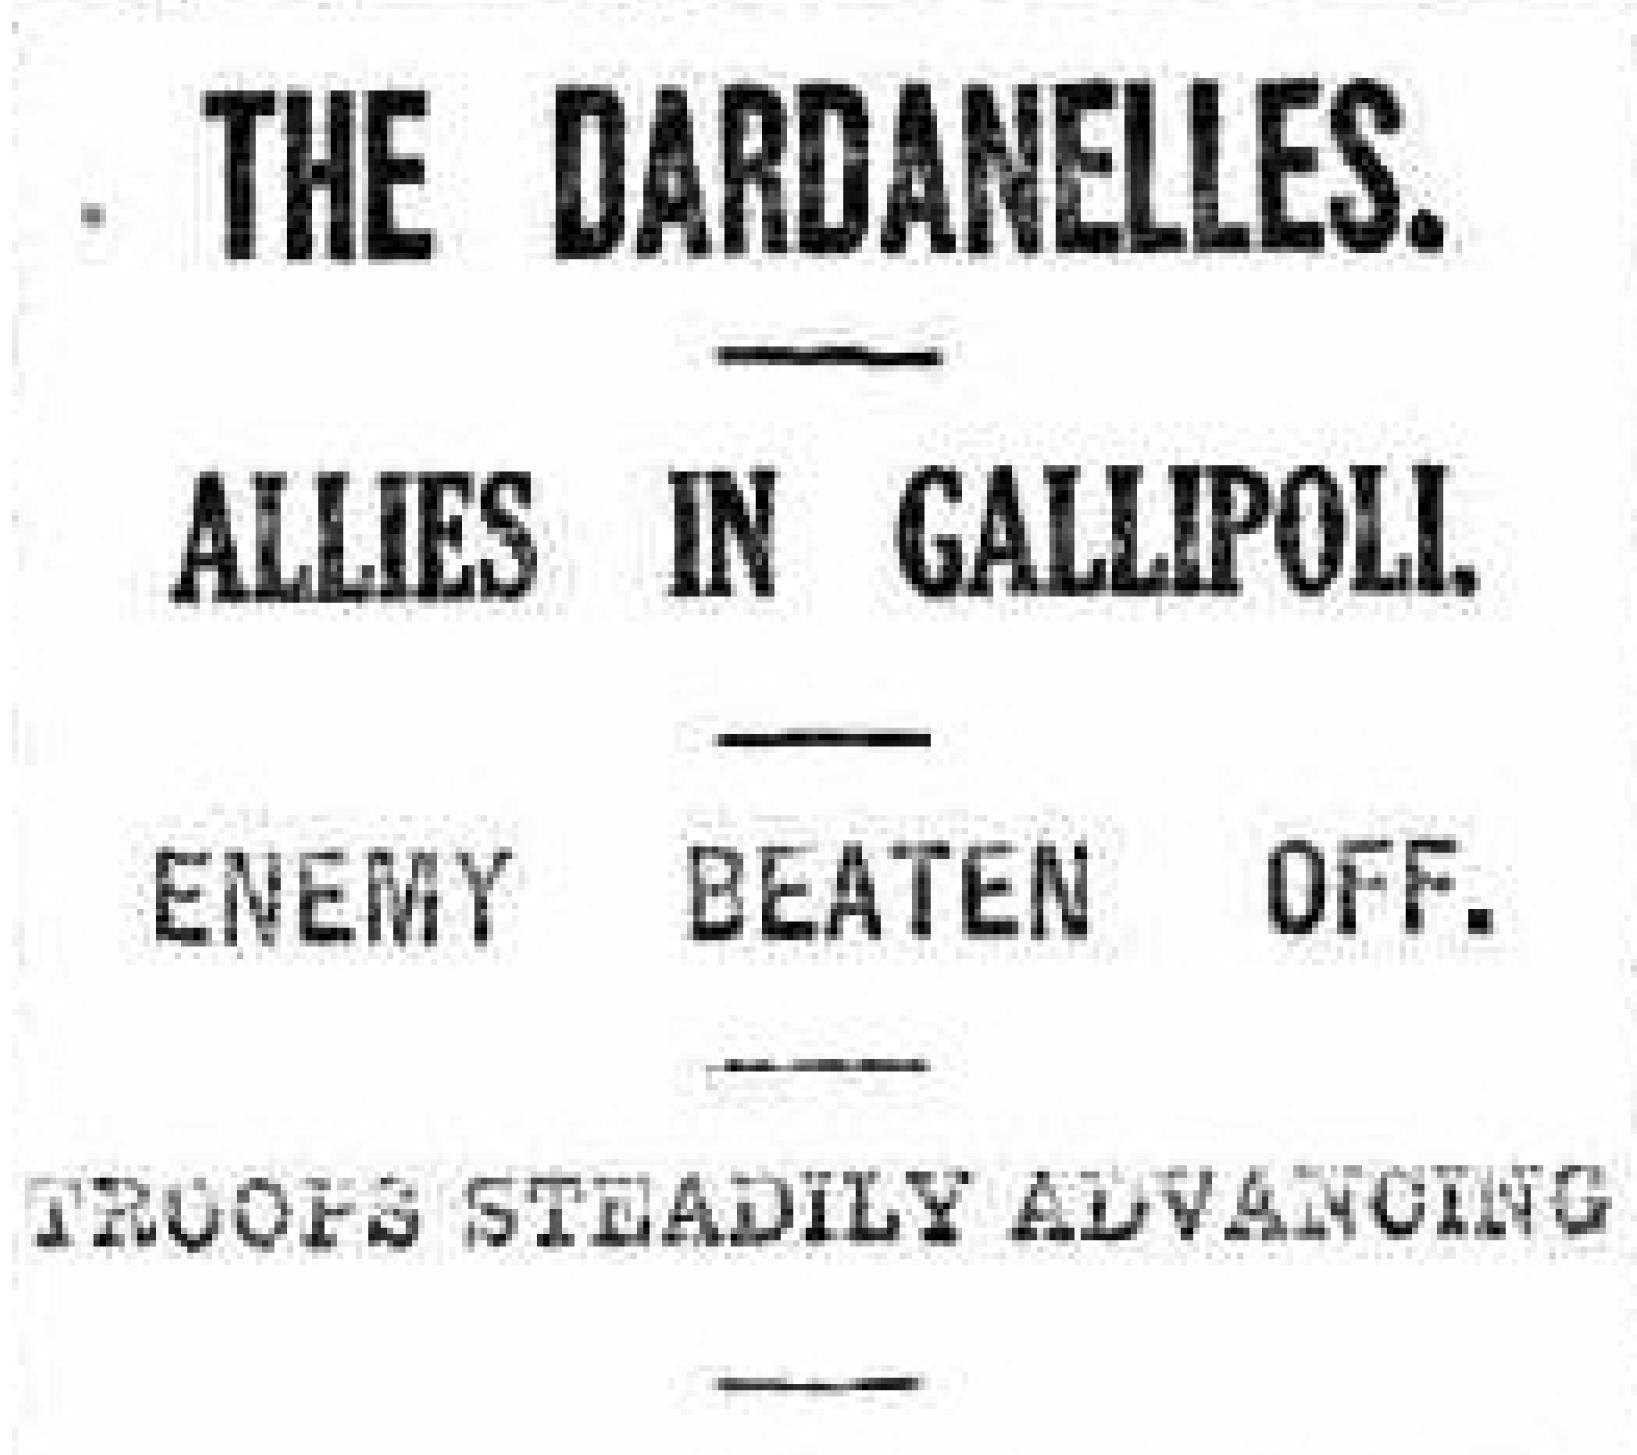 gallipoli newspaper articles 1915